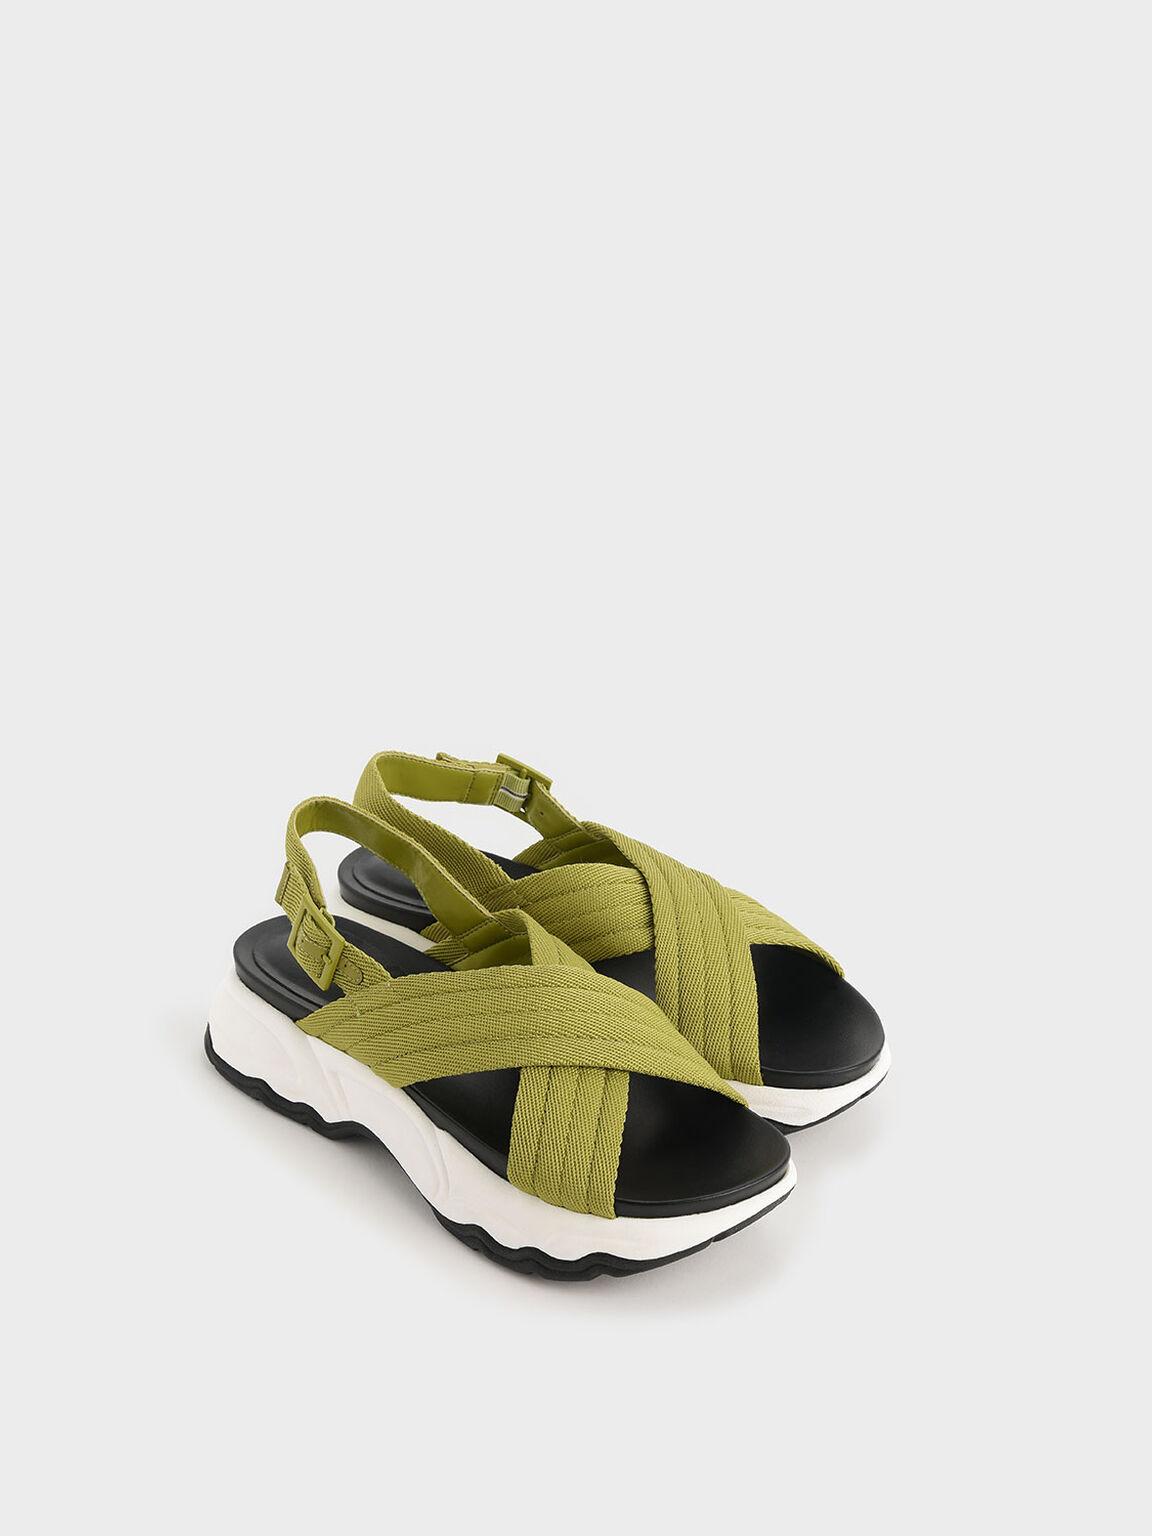 Nylon Criss Cross Chunky Platform Sandals, Green, hi-res